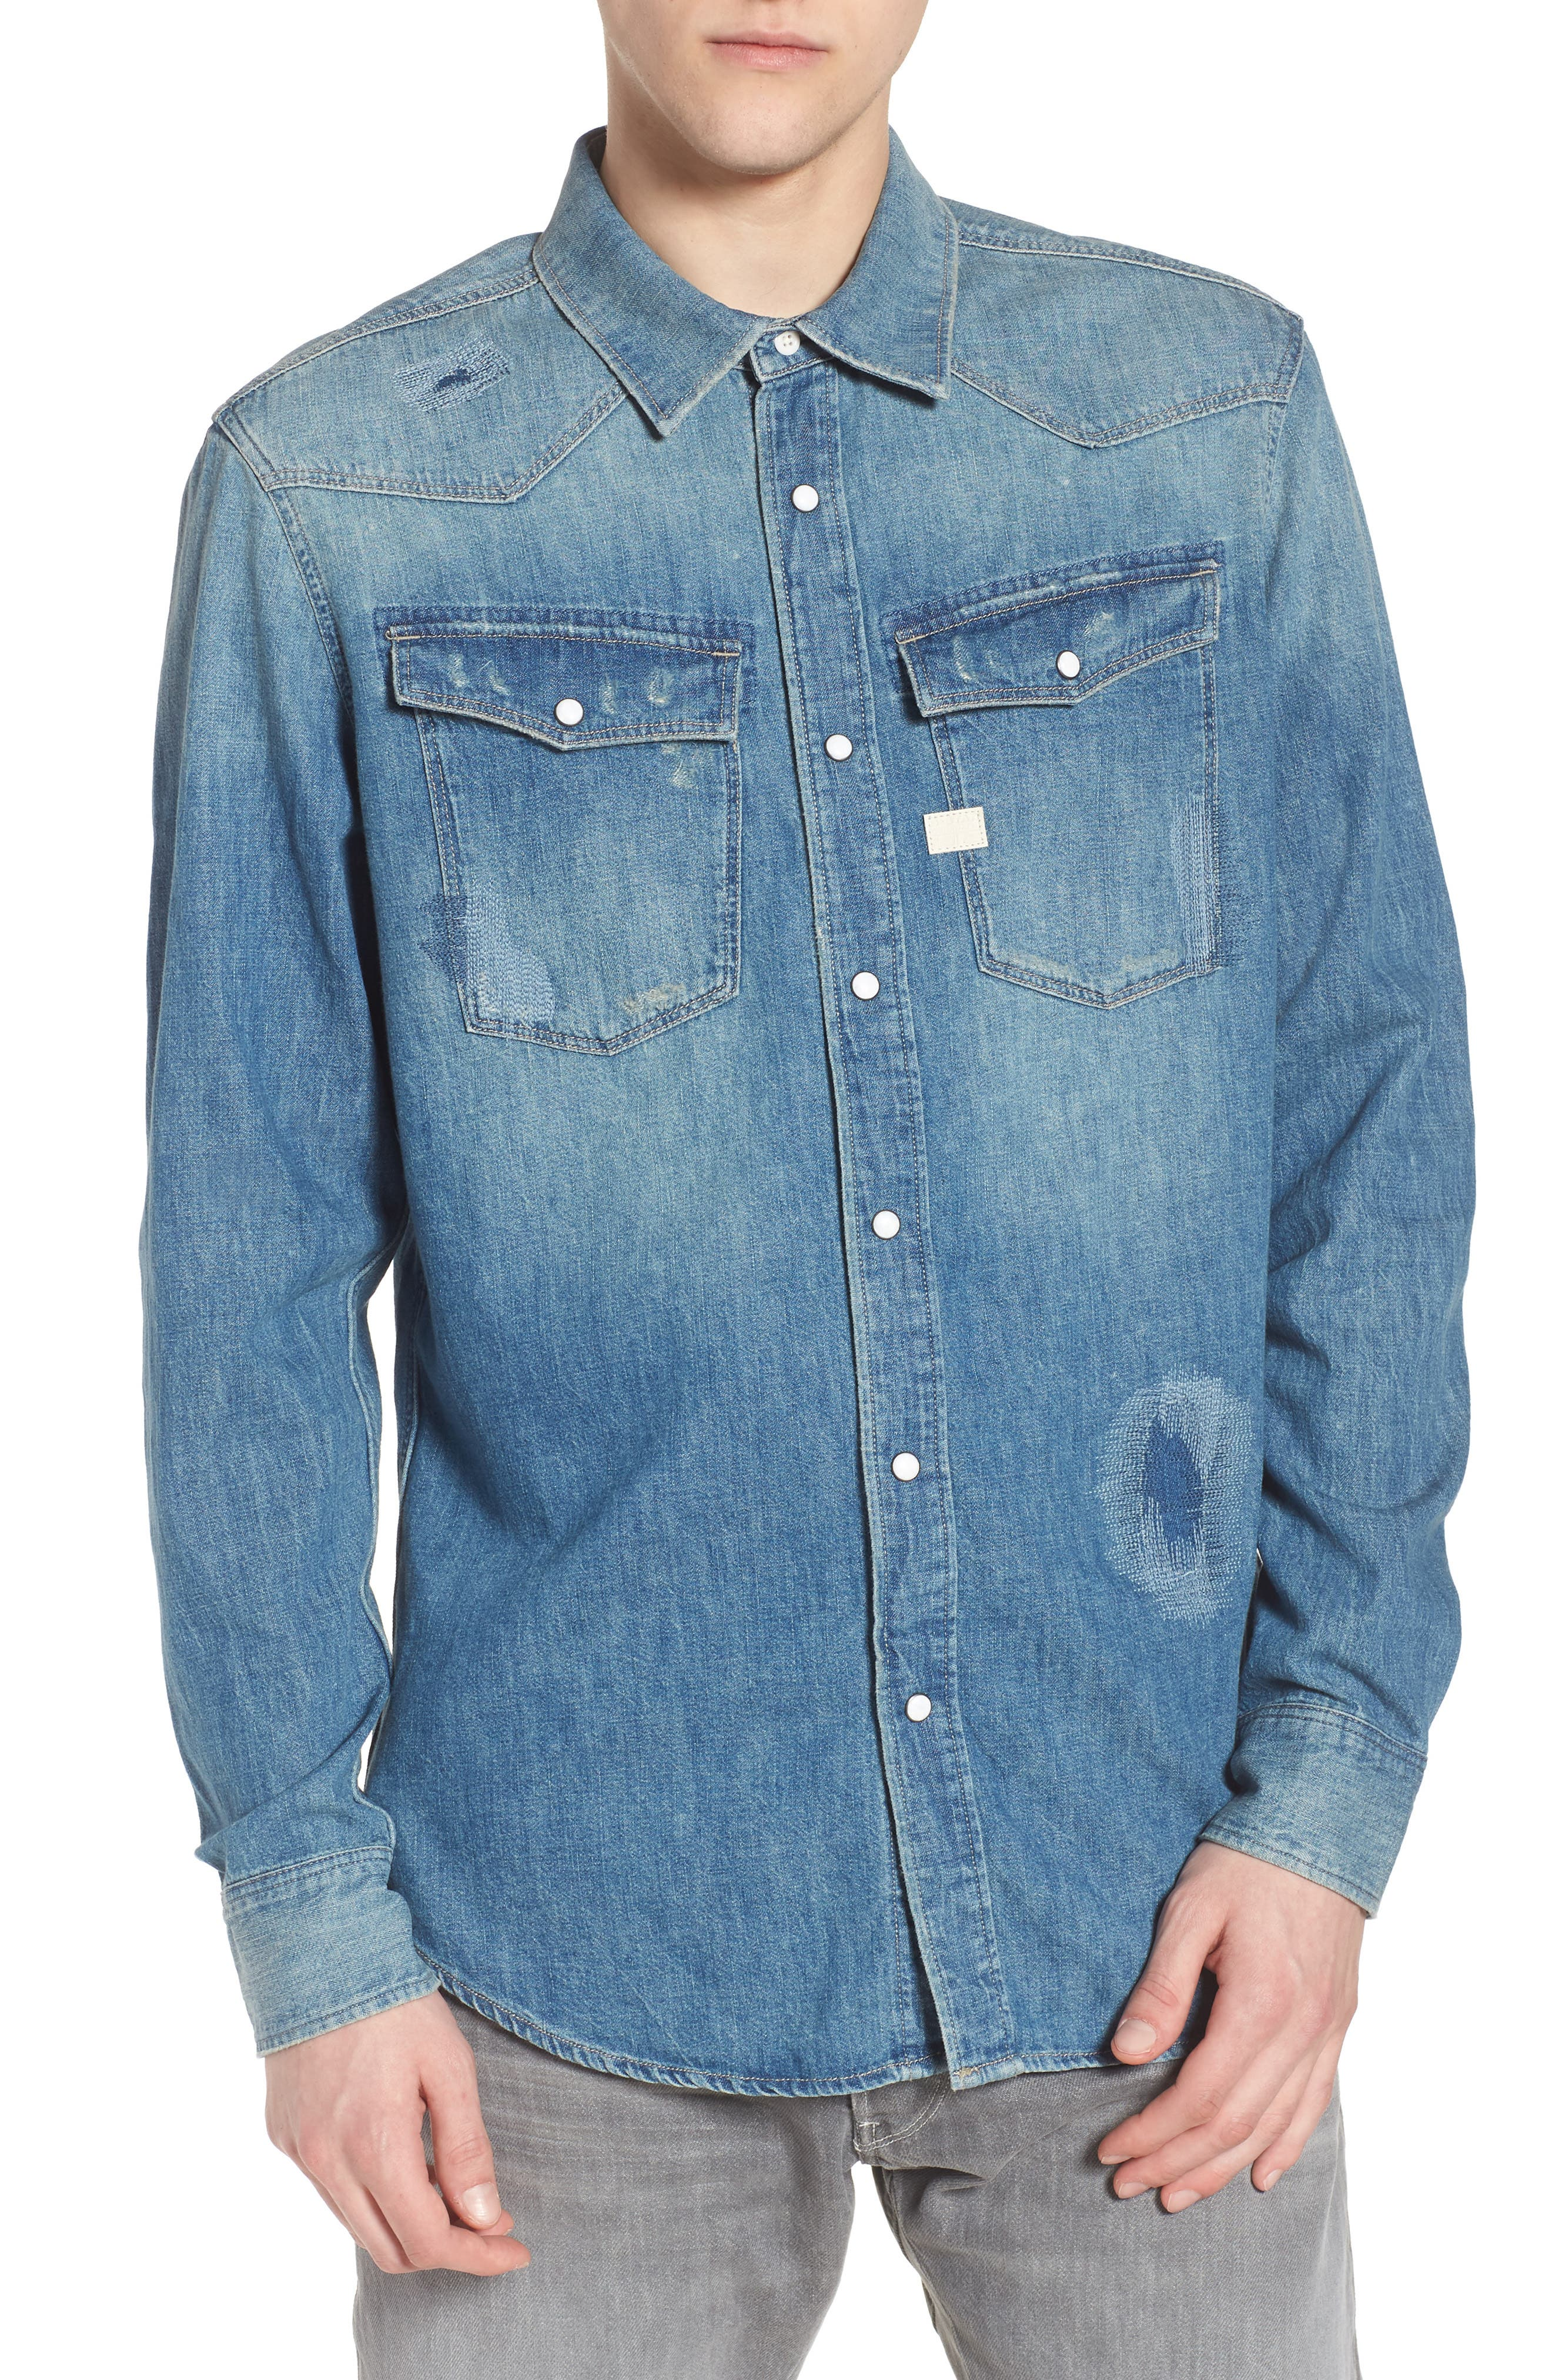 G-Star Raw 3301 Graft Denim Shirt